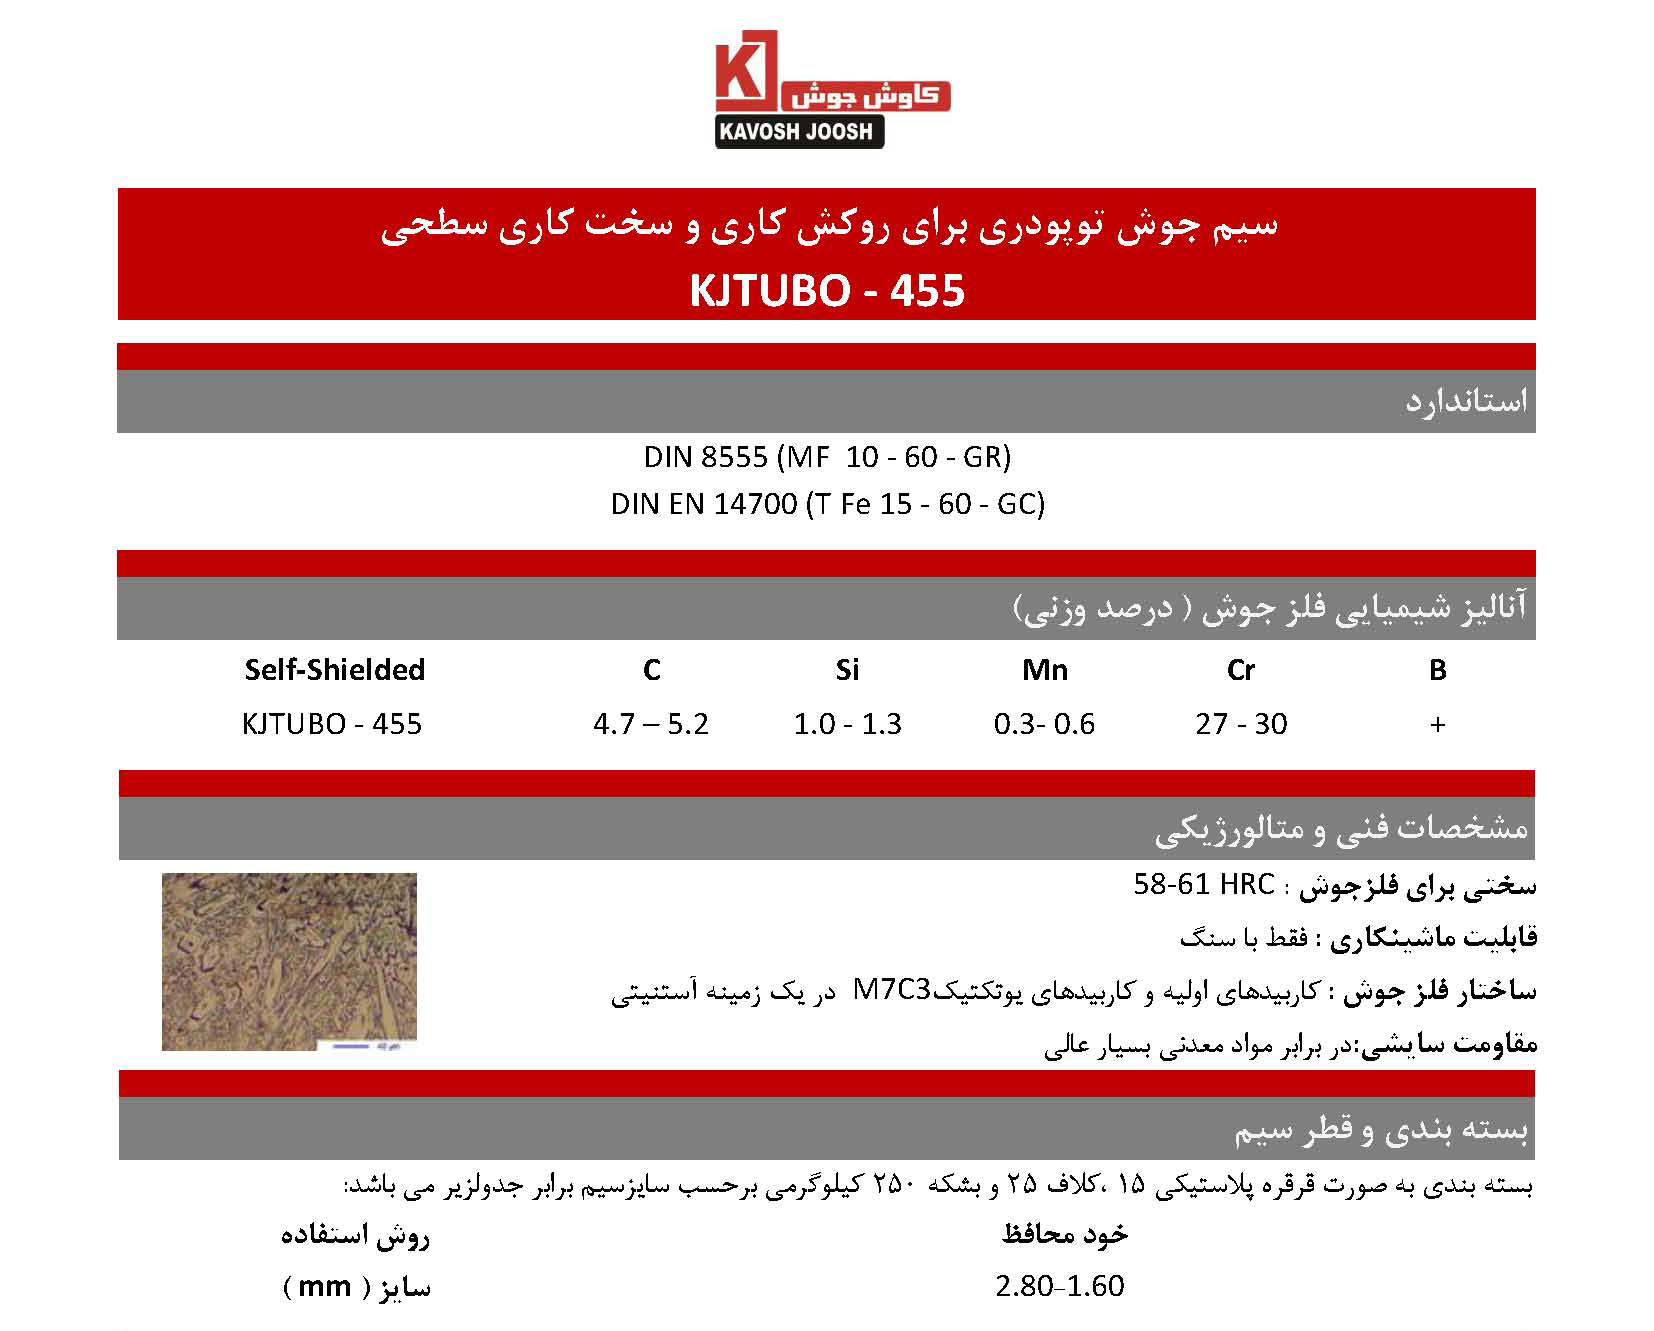 KJTUBO-455